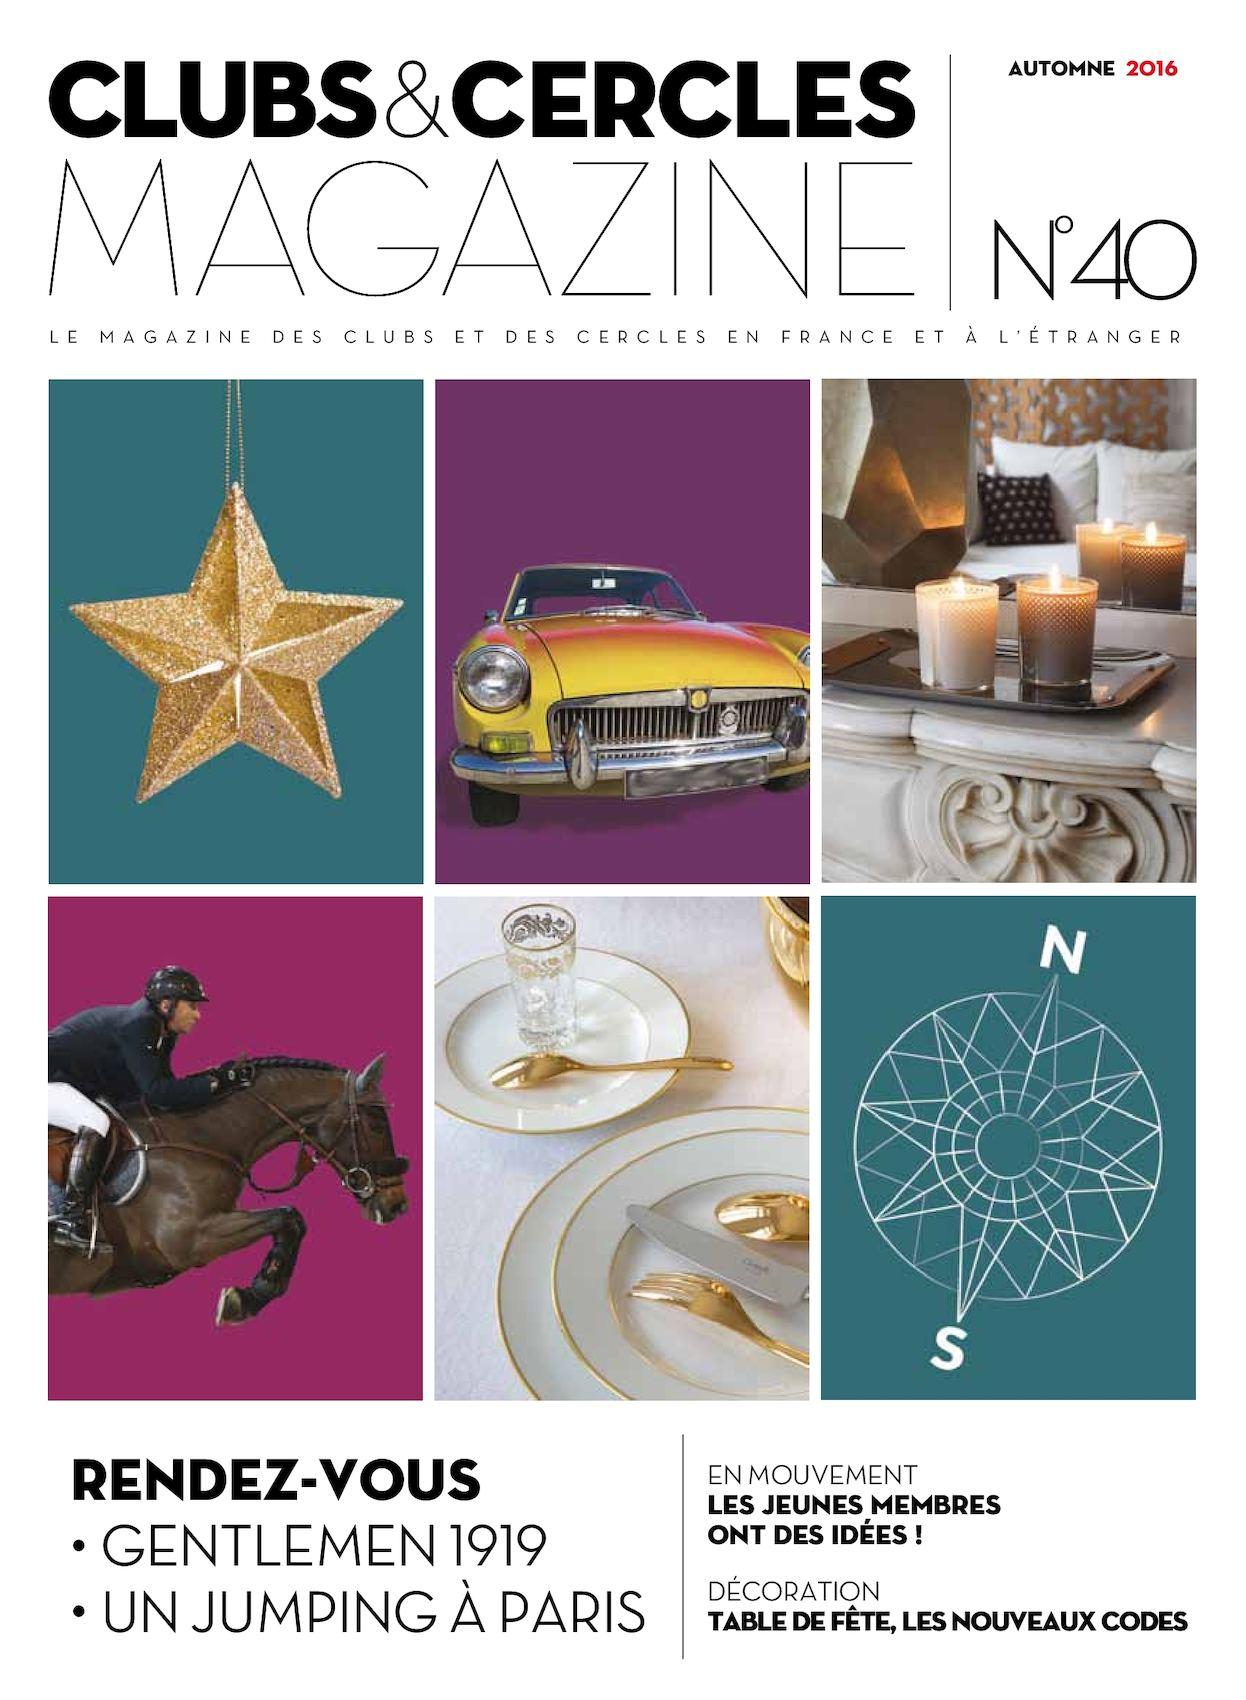 Calaméo - Magazine Clubs cercles 40 43d97dea4a23